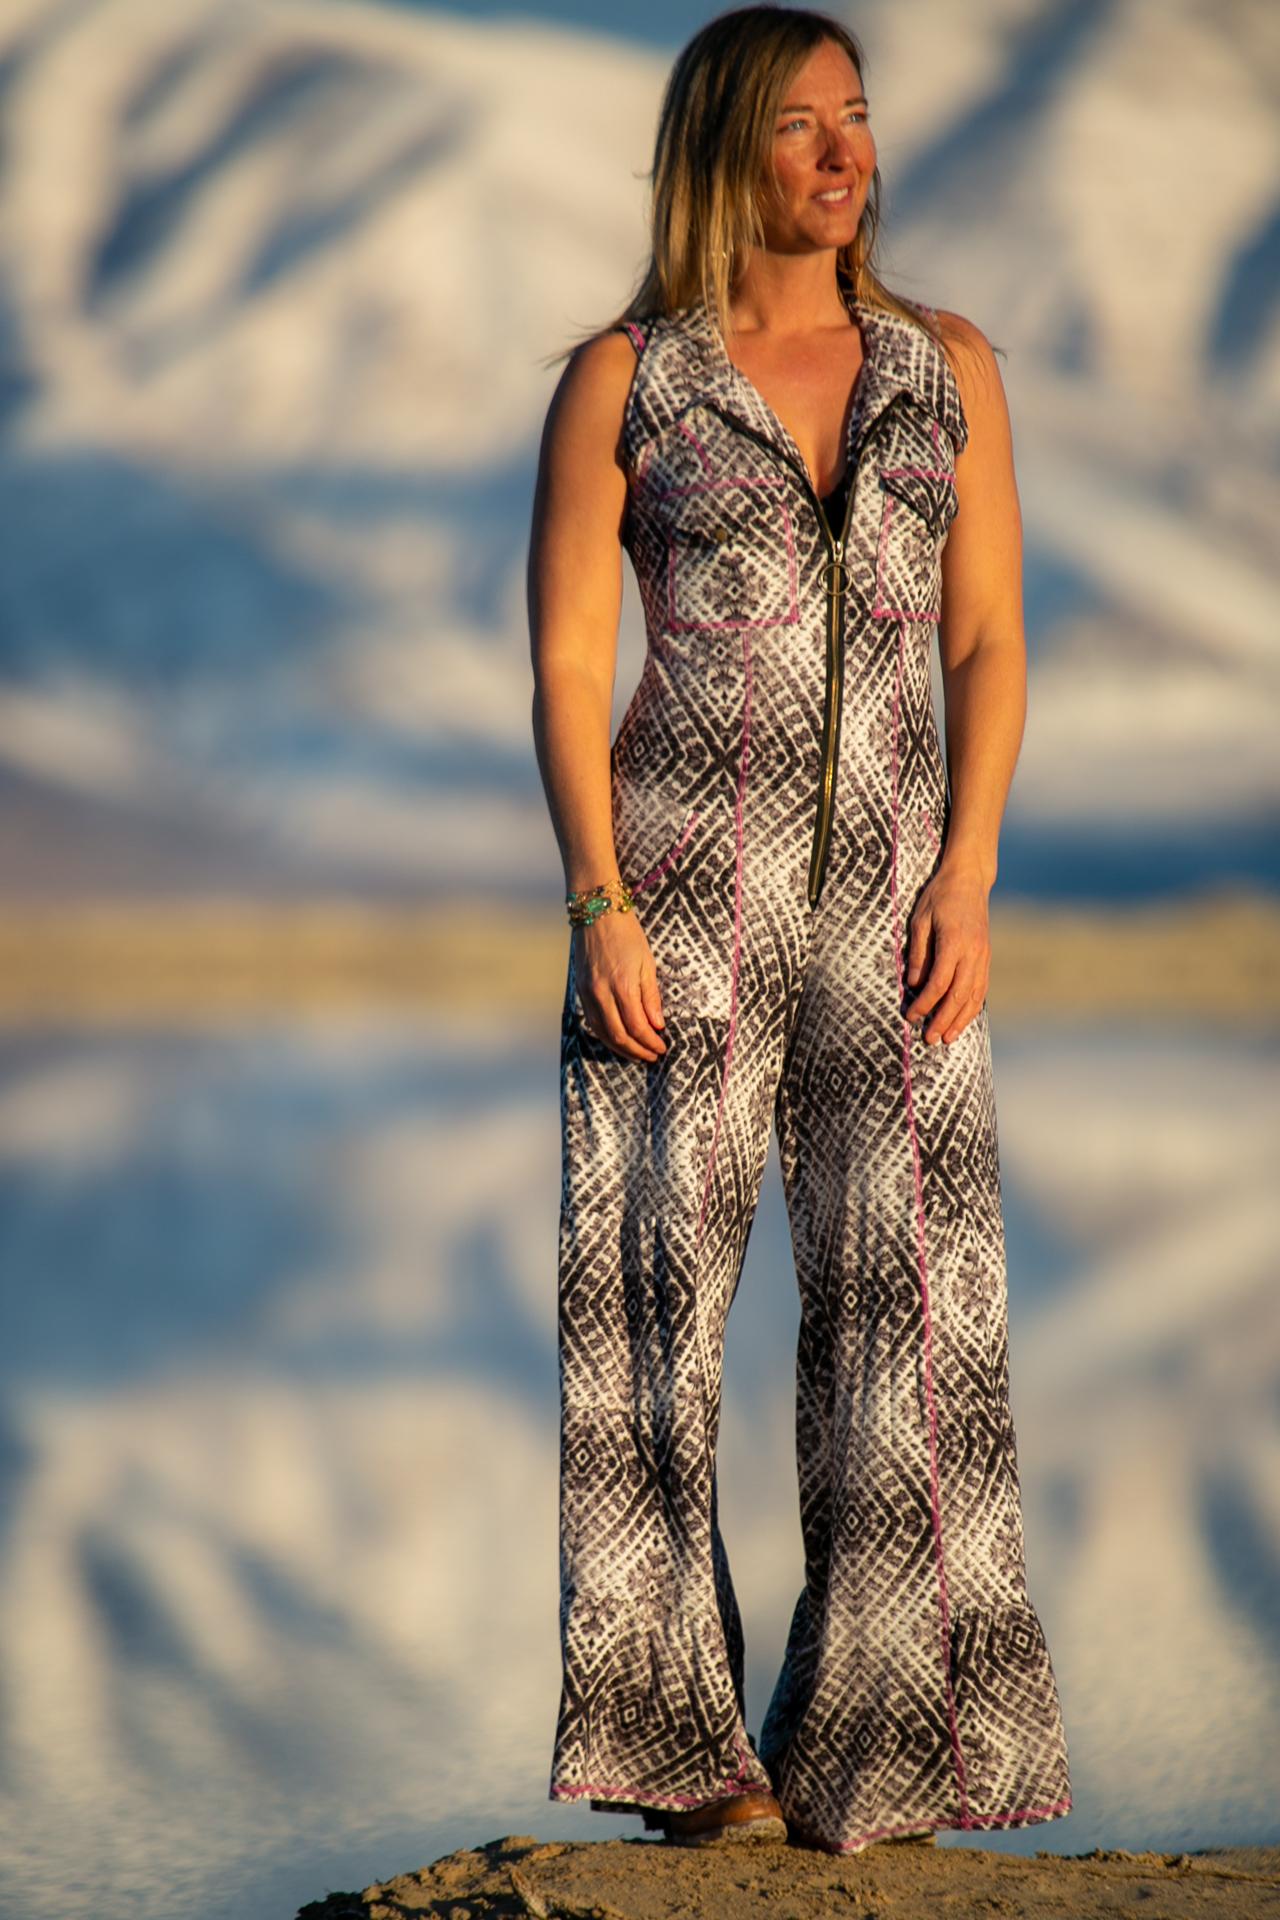 American Fashion Designer Autumn Teneyl looking super cute wearing a boho style tie dye one piece jumpsuit handmade in Colorado.